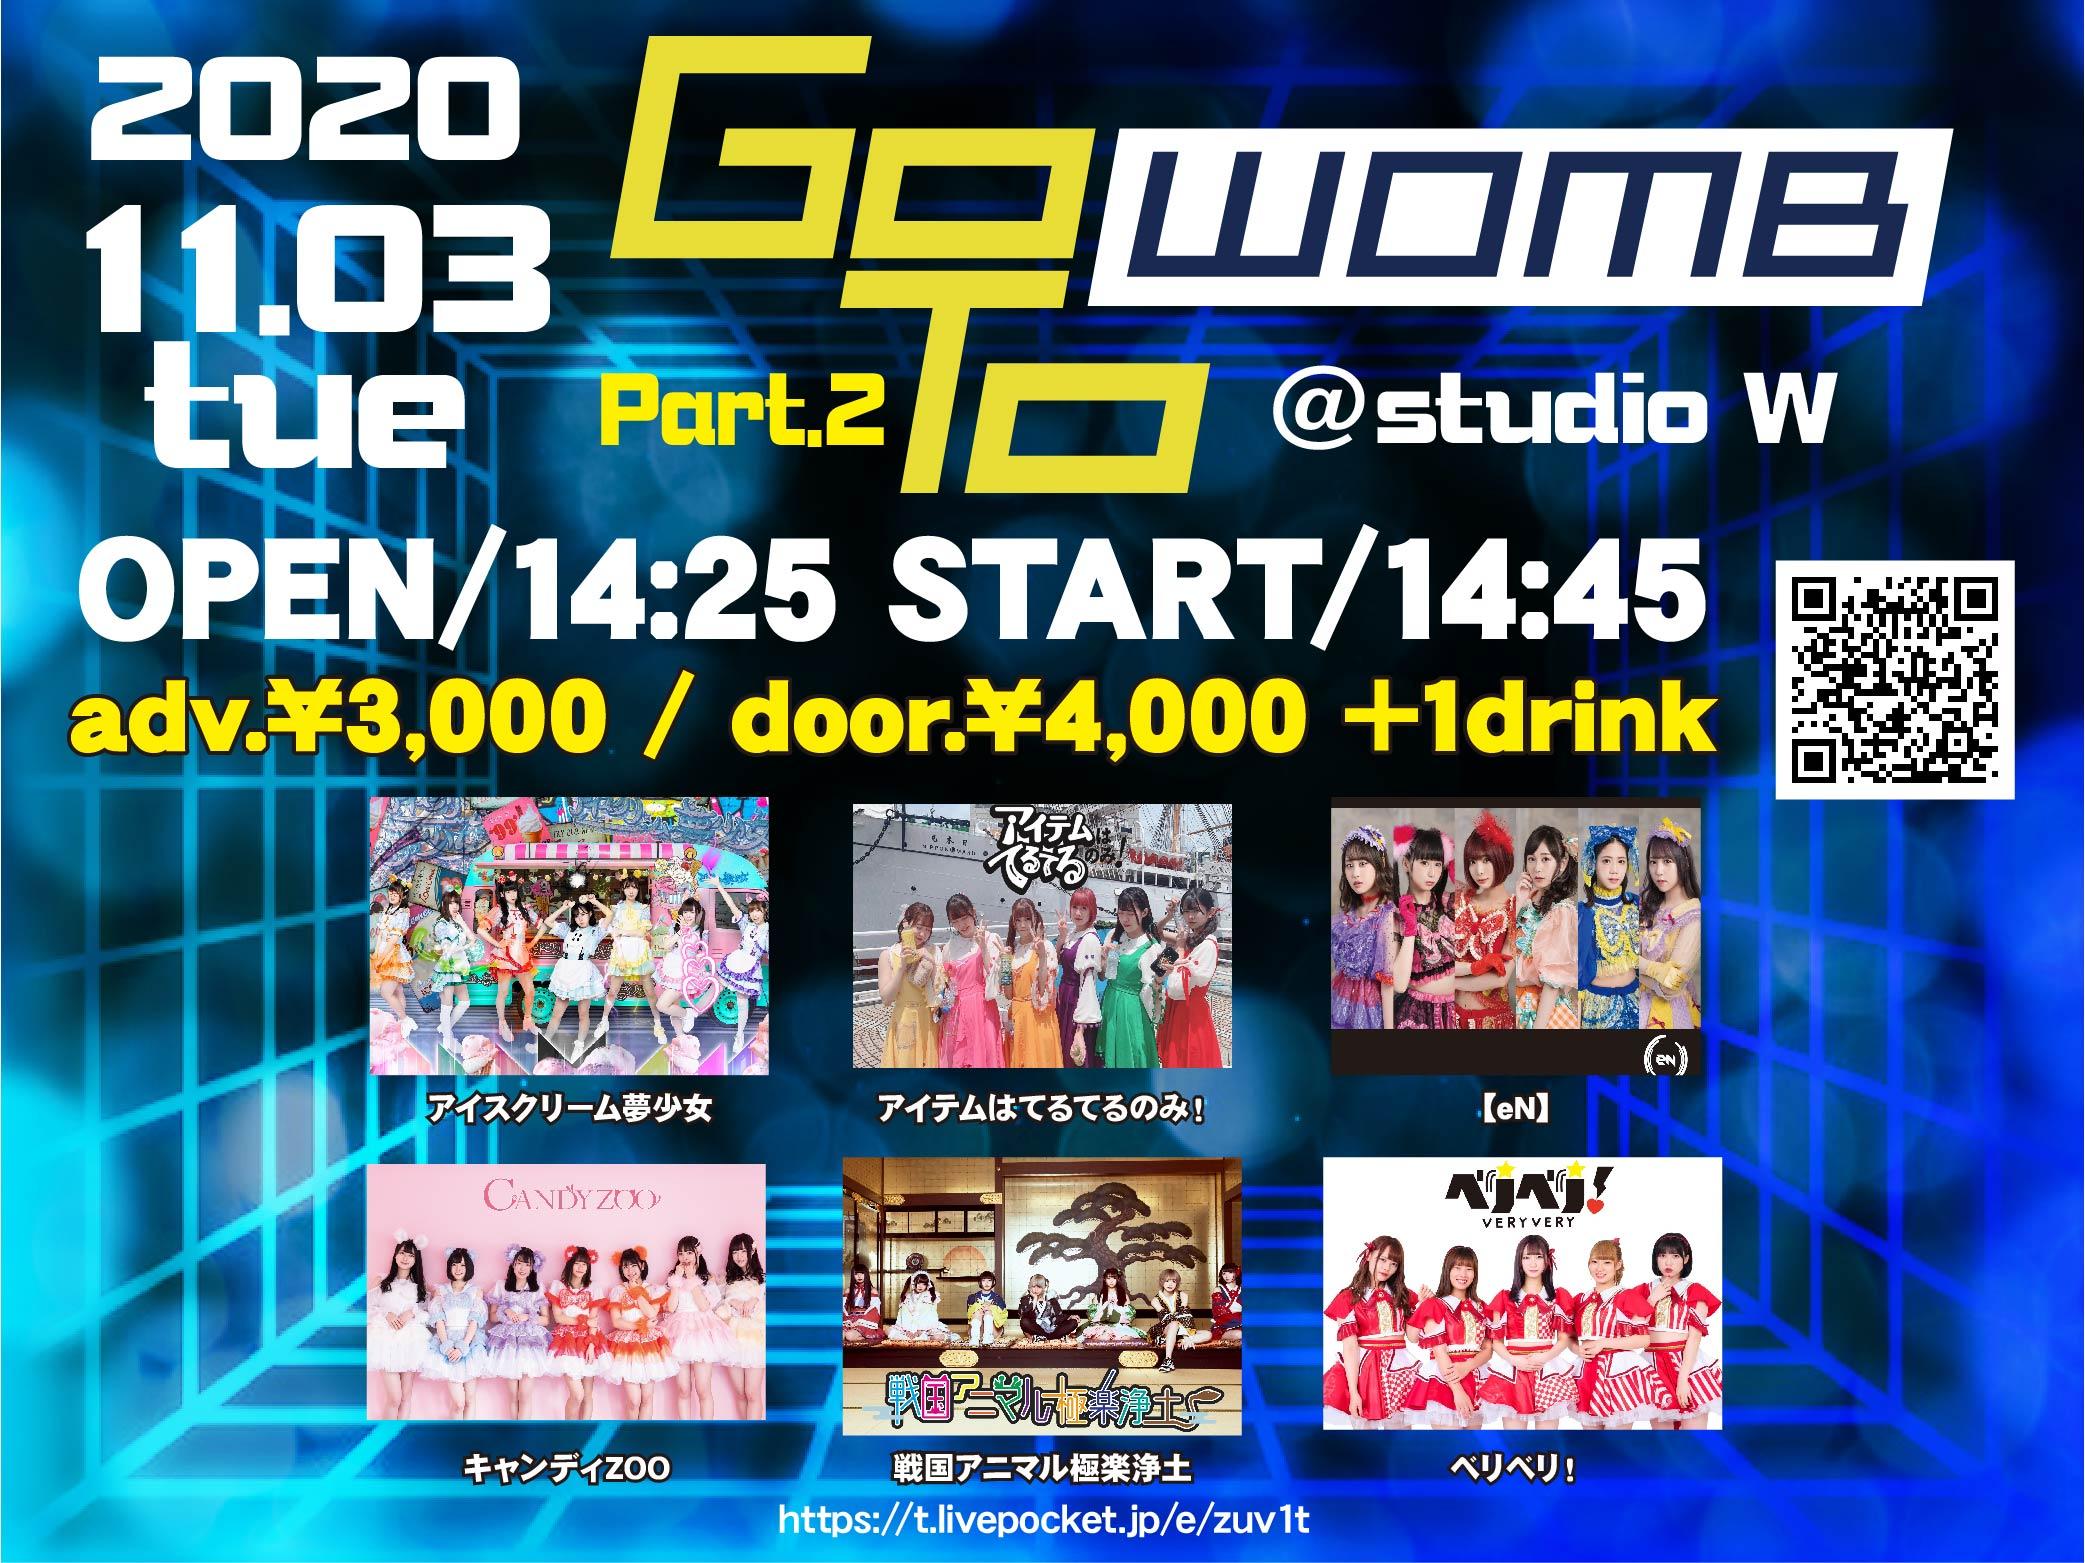 「GoTo WOMB」Part.2  ※「GoTo VISION」が会場変更に伴い「GoTo WOMB」に変更となりました。